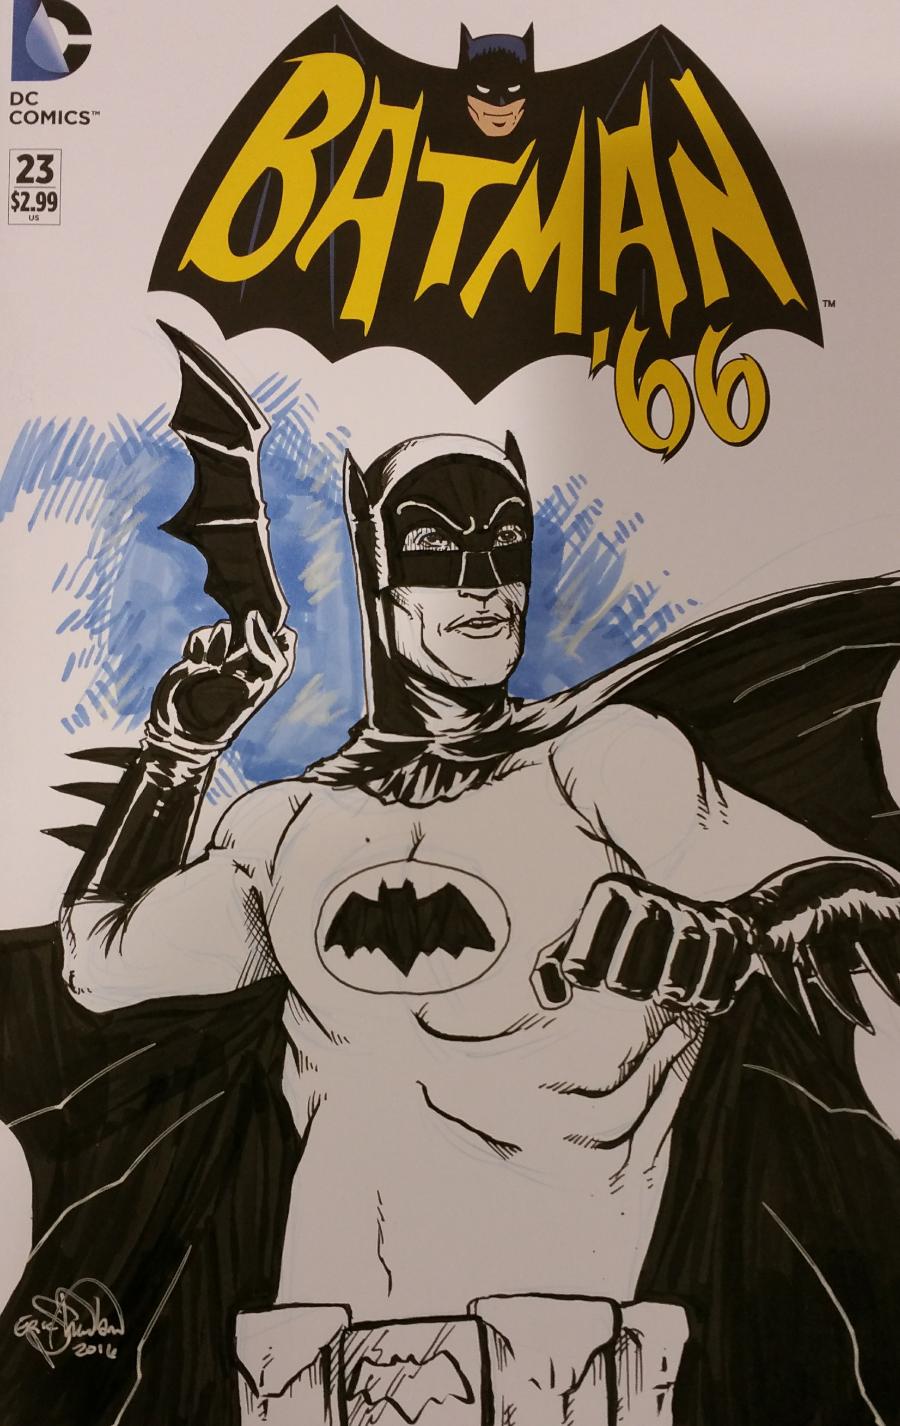 504. Batman '66